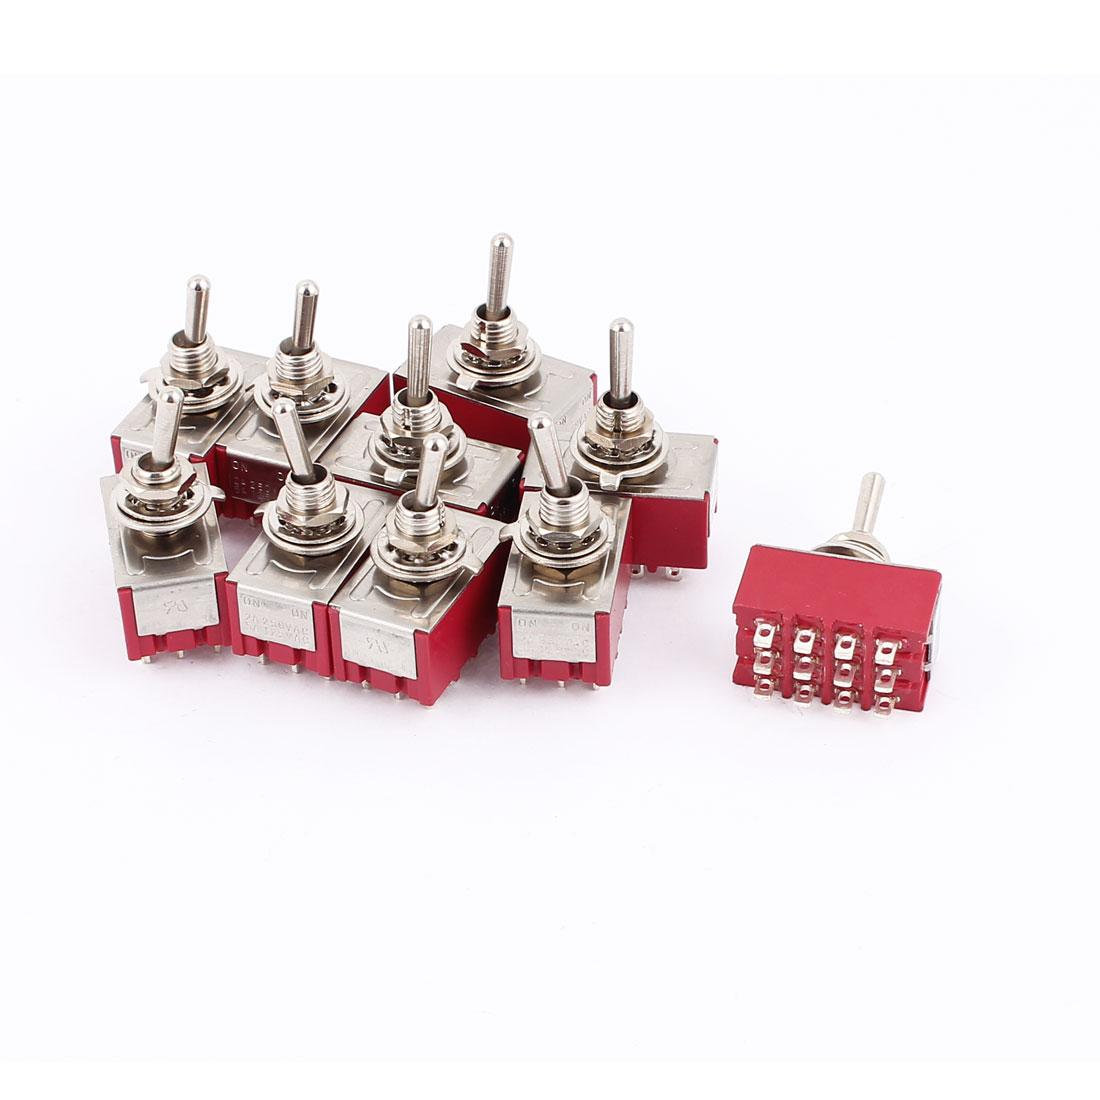 AC 250V/2A 125V/5A 12-Pin On/On 2 Position Miniature SPDT Toggle Switch 12 Pcs